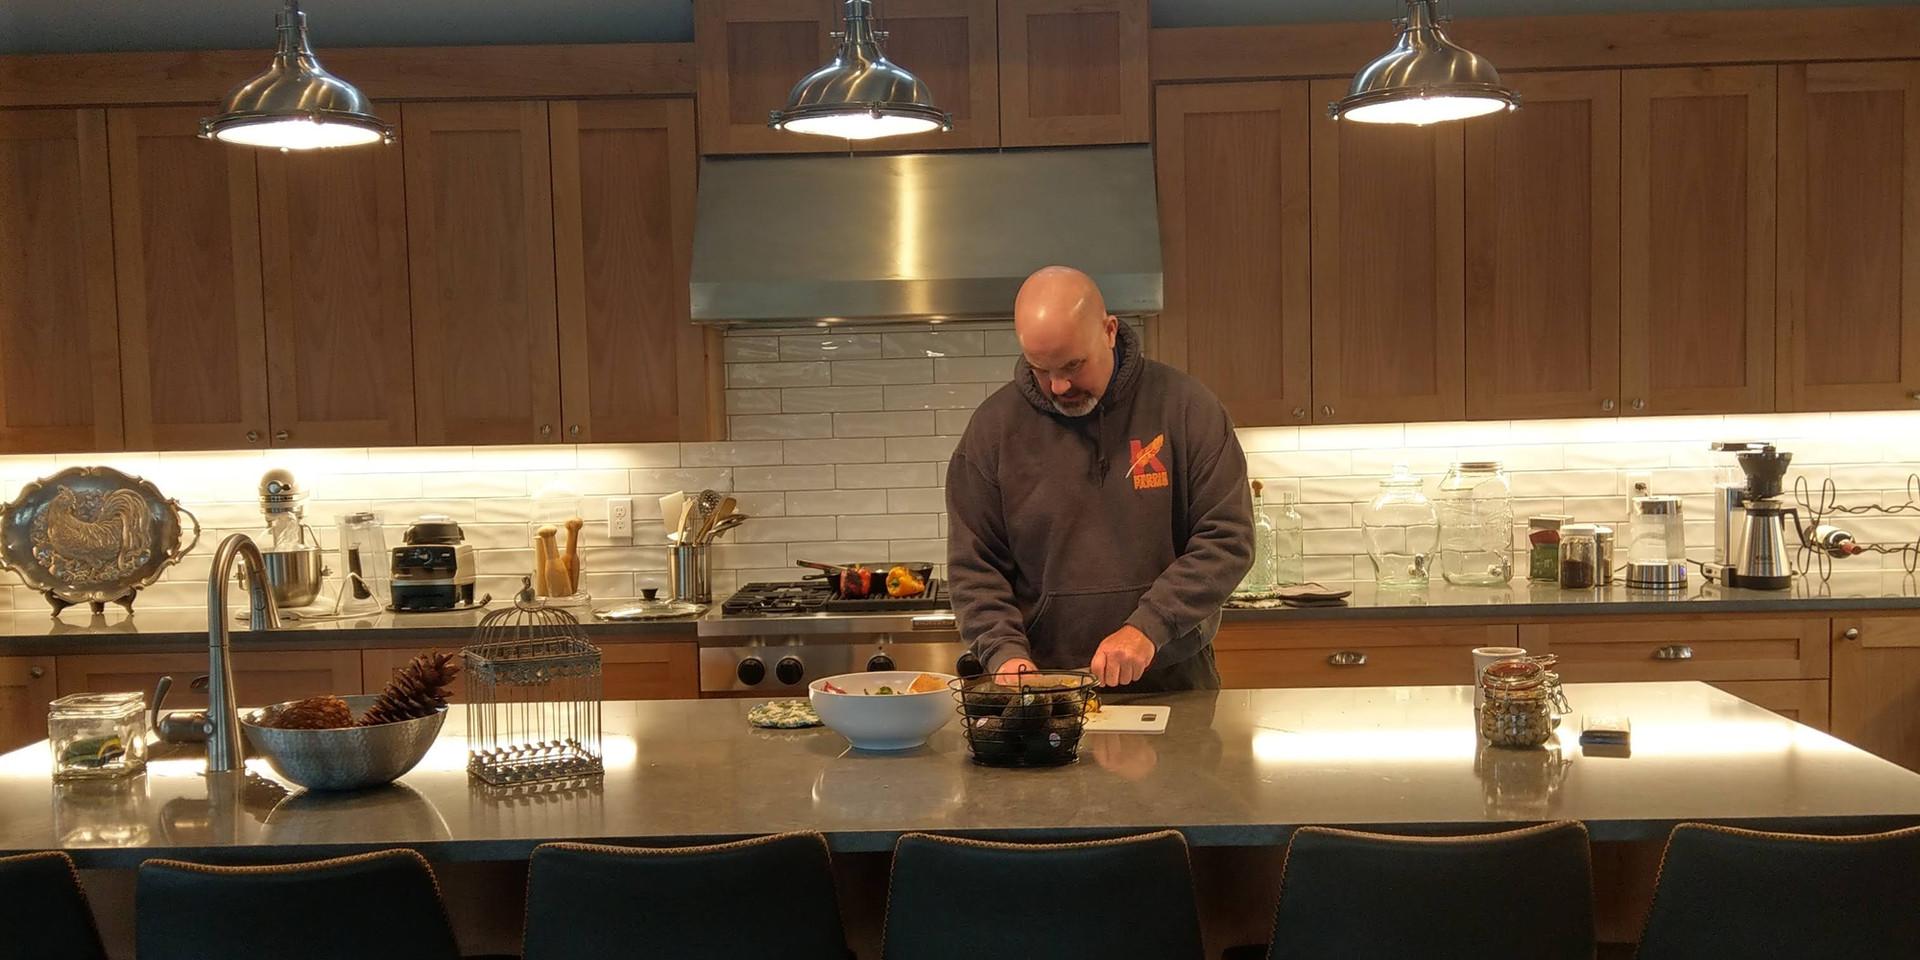 Reg working away in The Kitchen